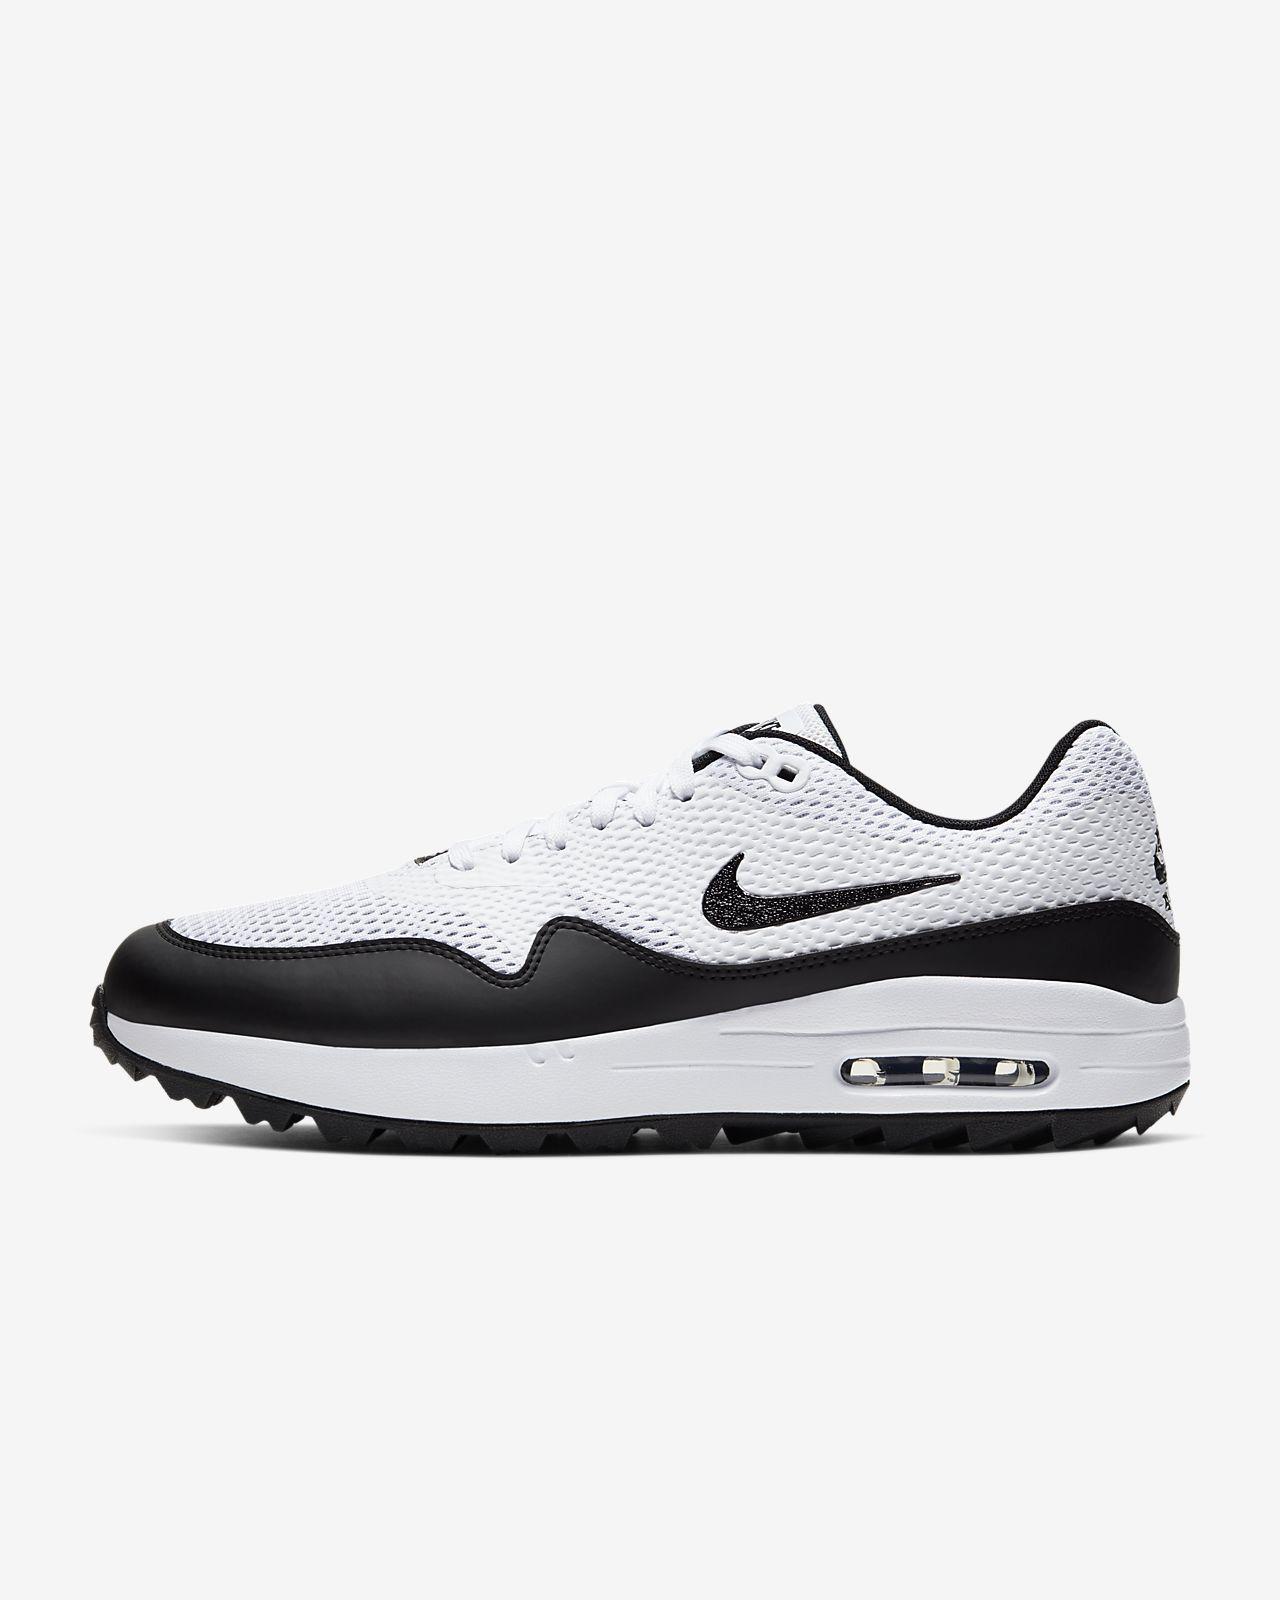 Nike Air Max 1 G Men's Golf Shoe. Nike ZA